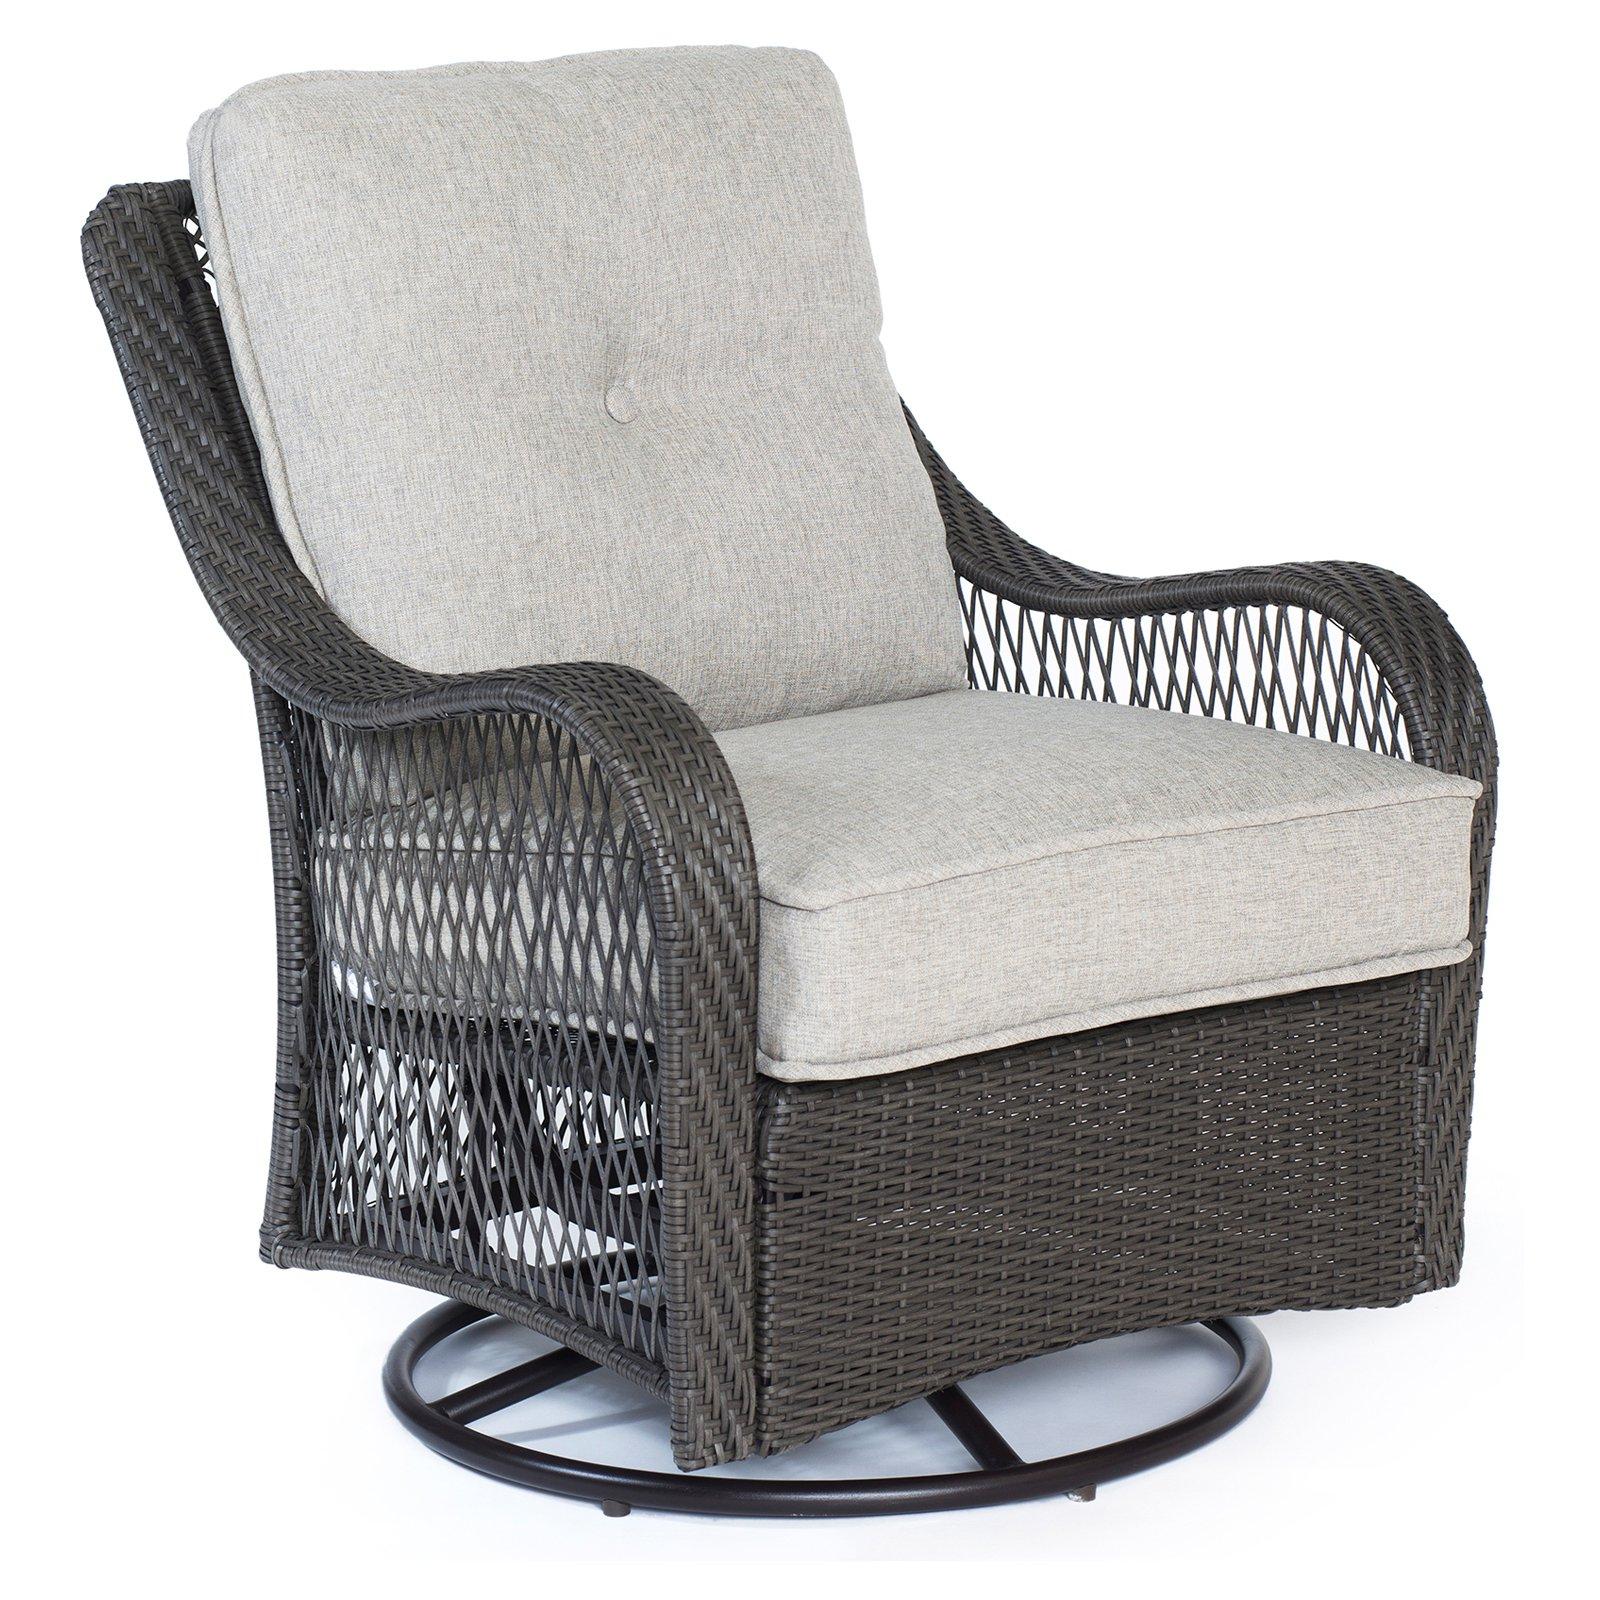 Carolina Factory Direct Morrow Swivel Gliding Chairs Set